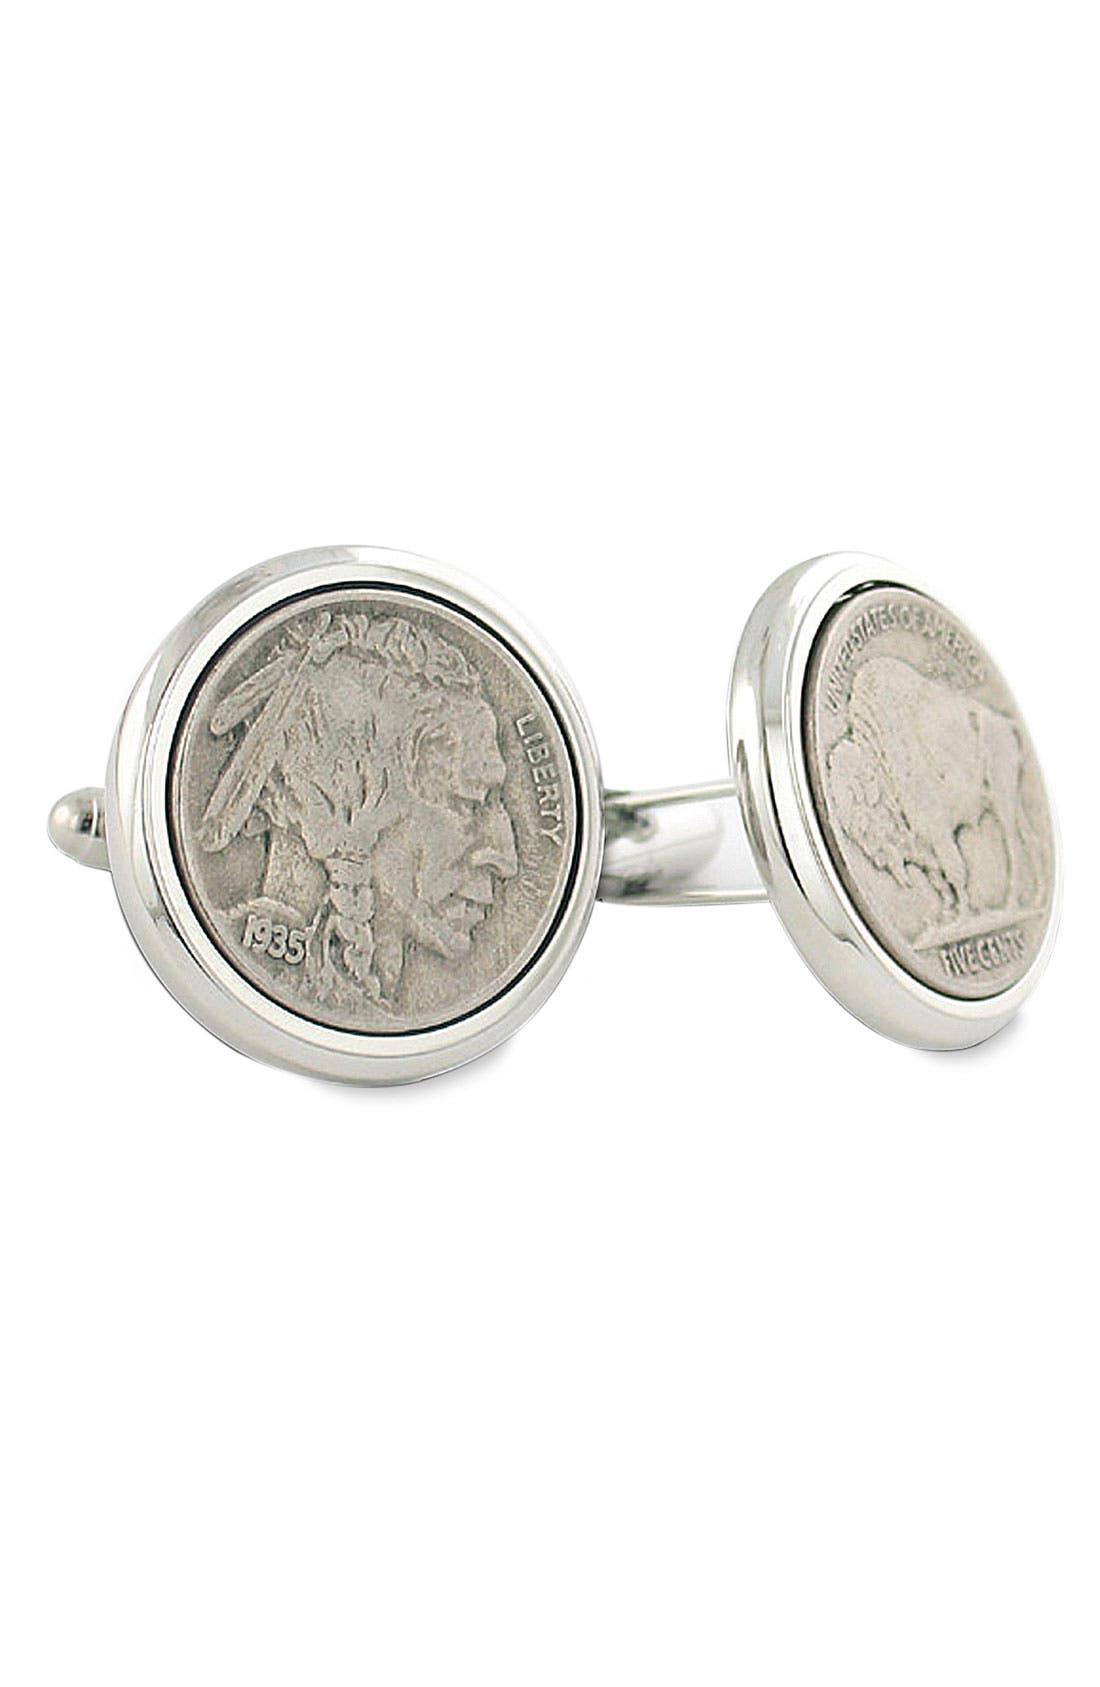 Alternate Image 1 Selected - David Donahue Buffalo Nickel Cuff Links